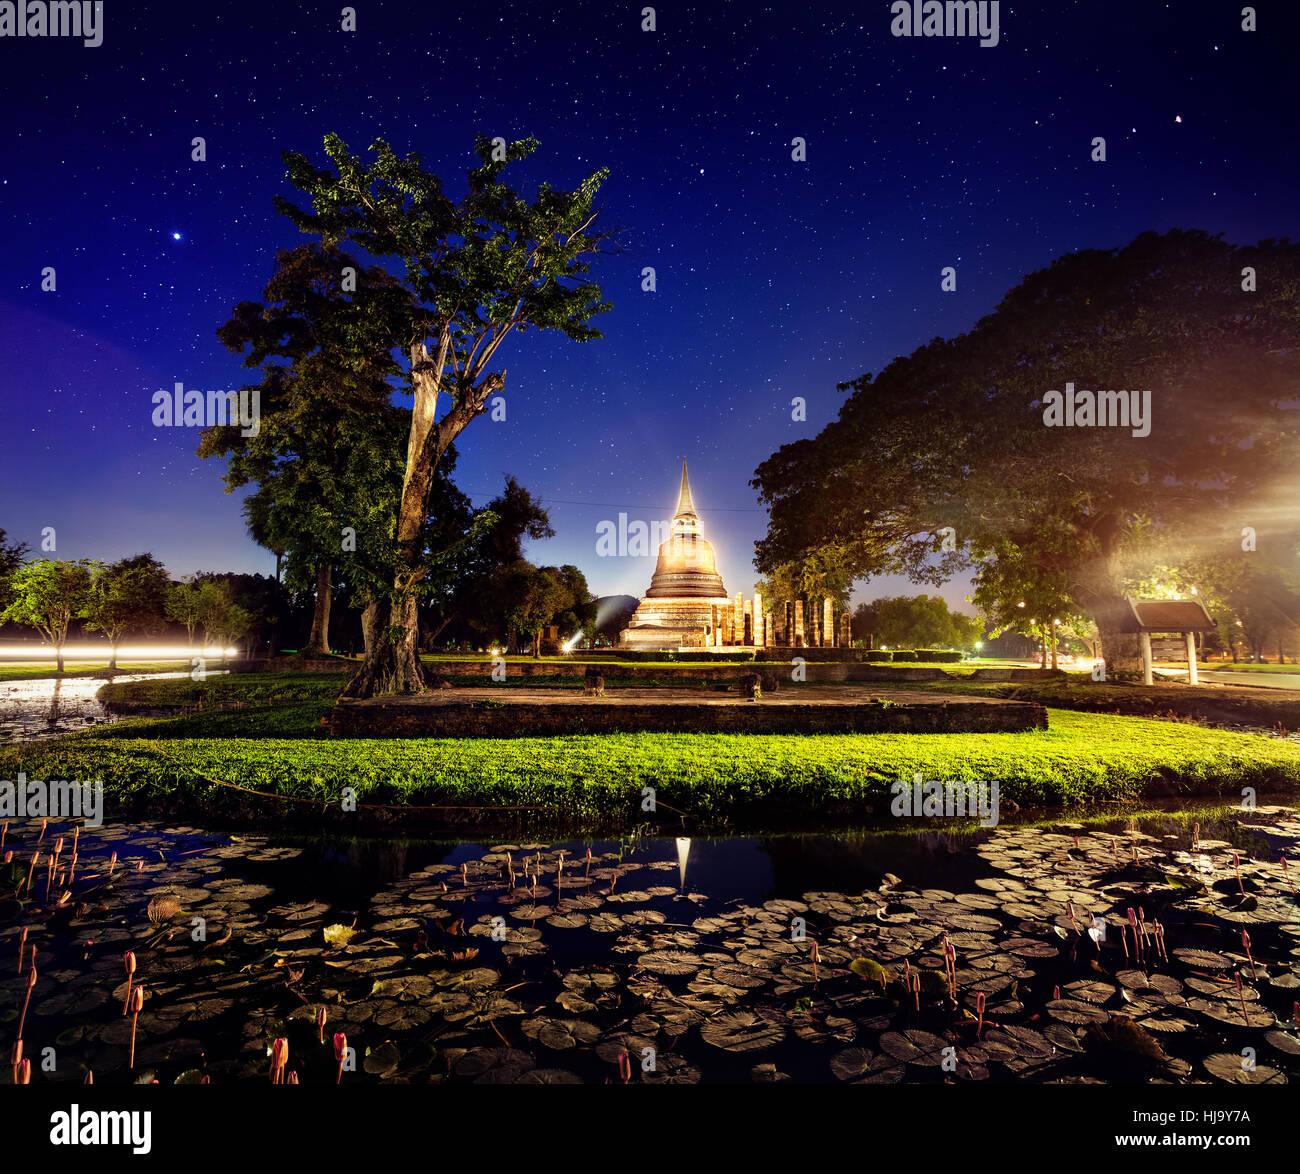 Light show in Golden Stupa Buddhist Temple in Sukhothai Historical Park, Thailand Stock Photo